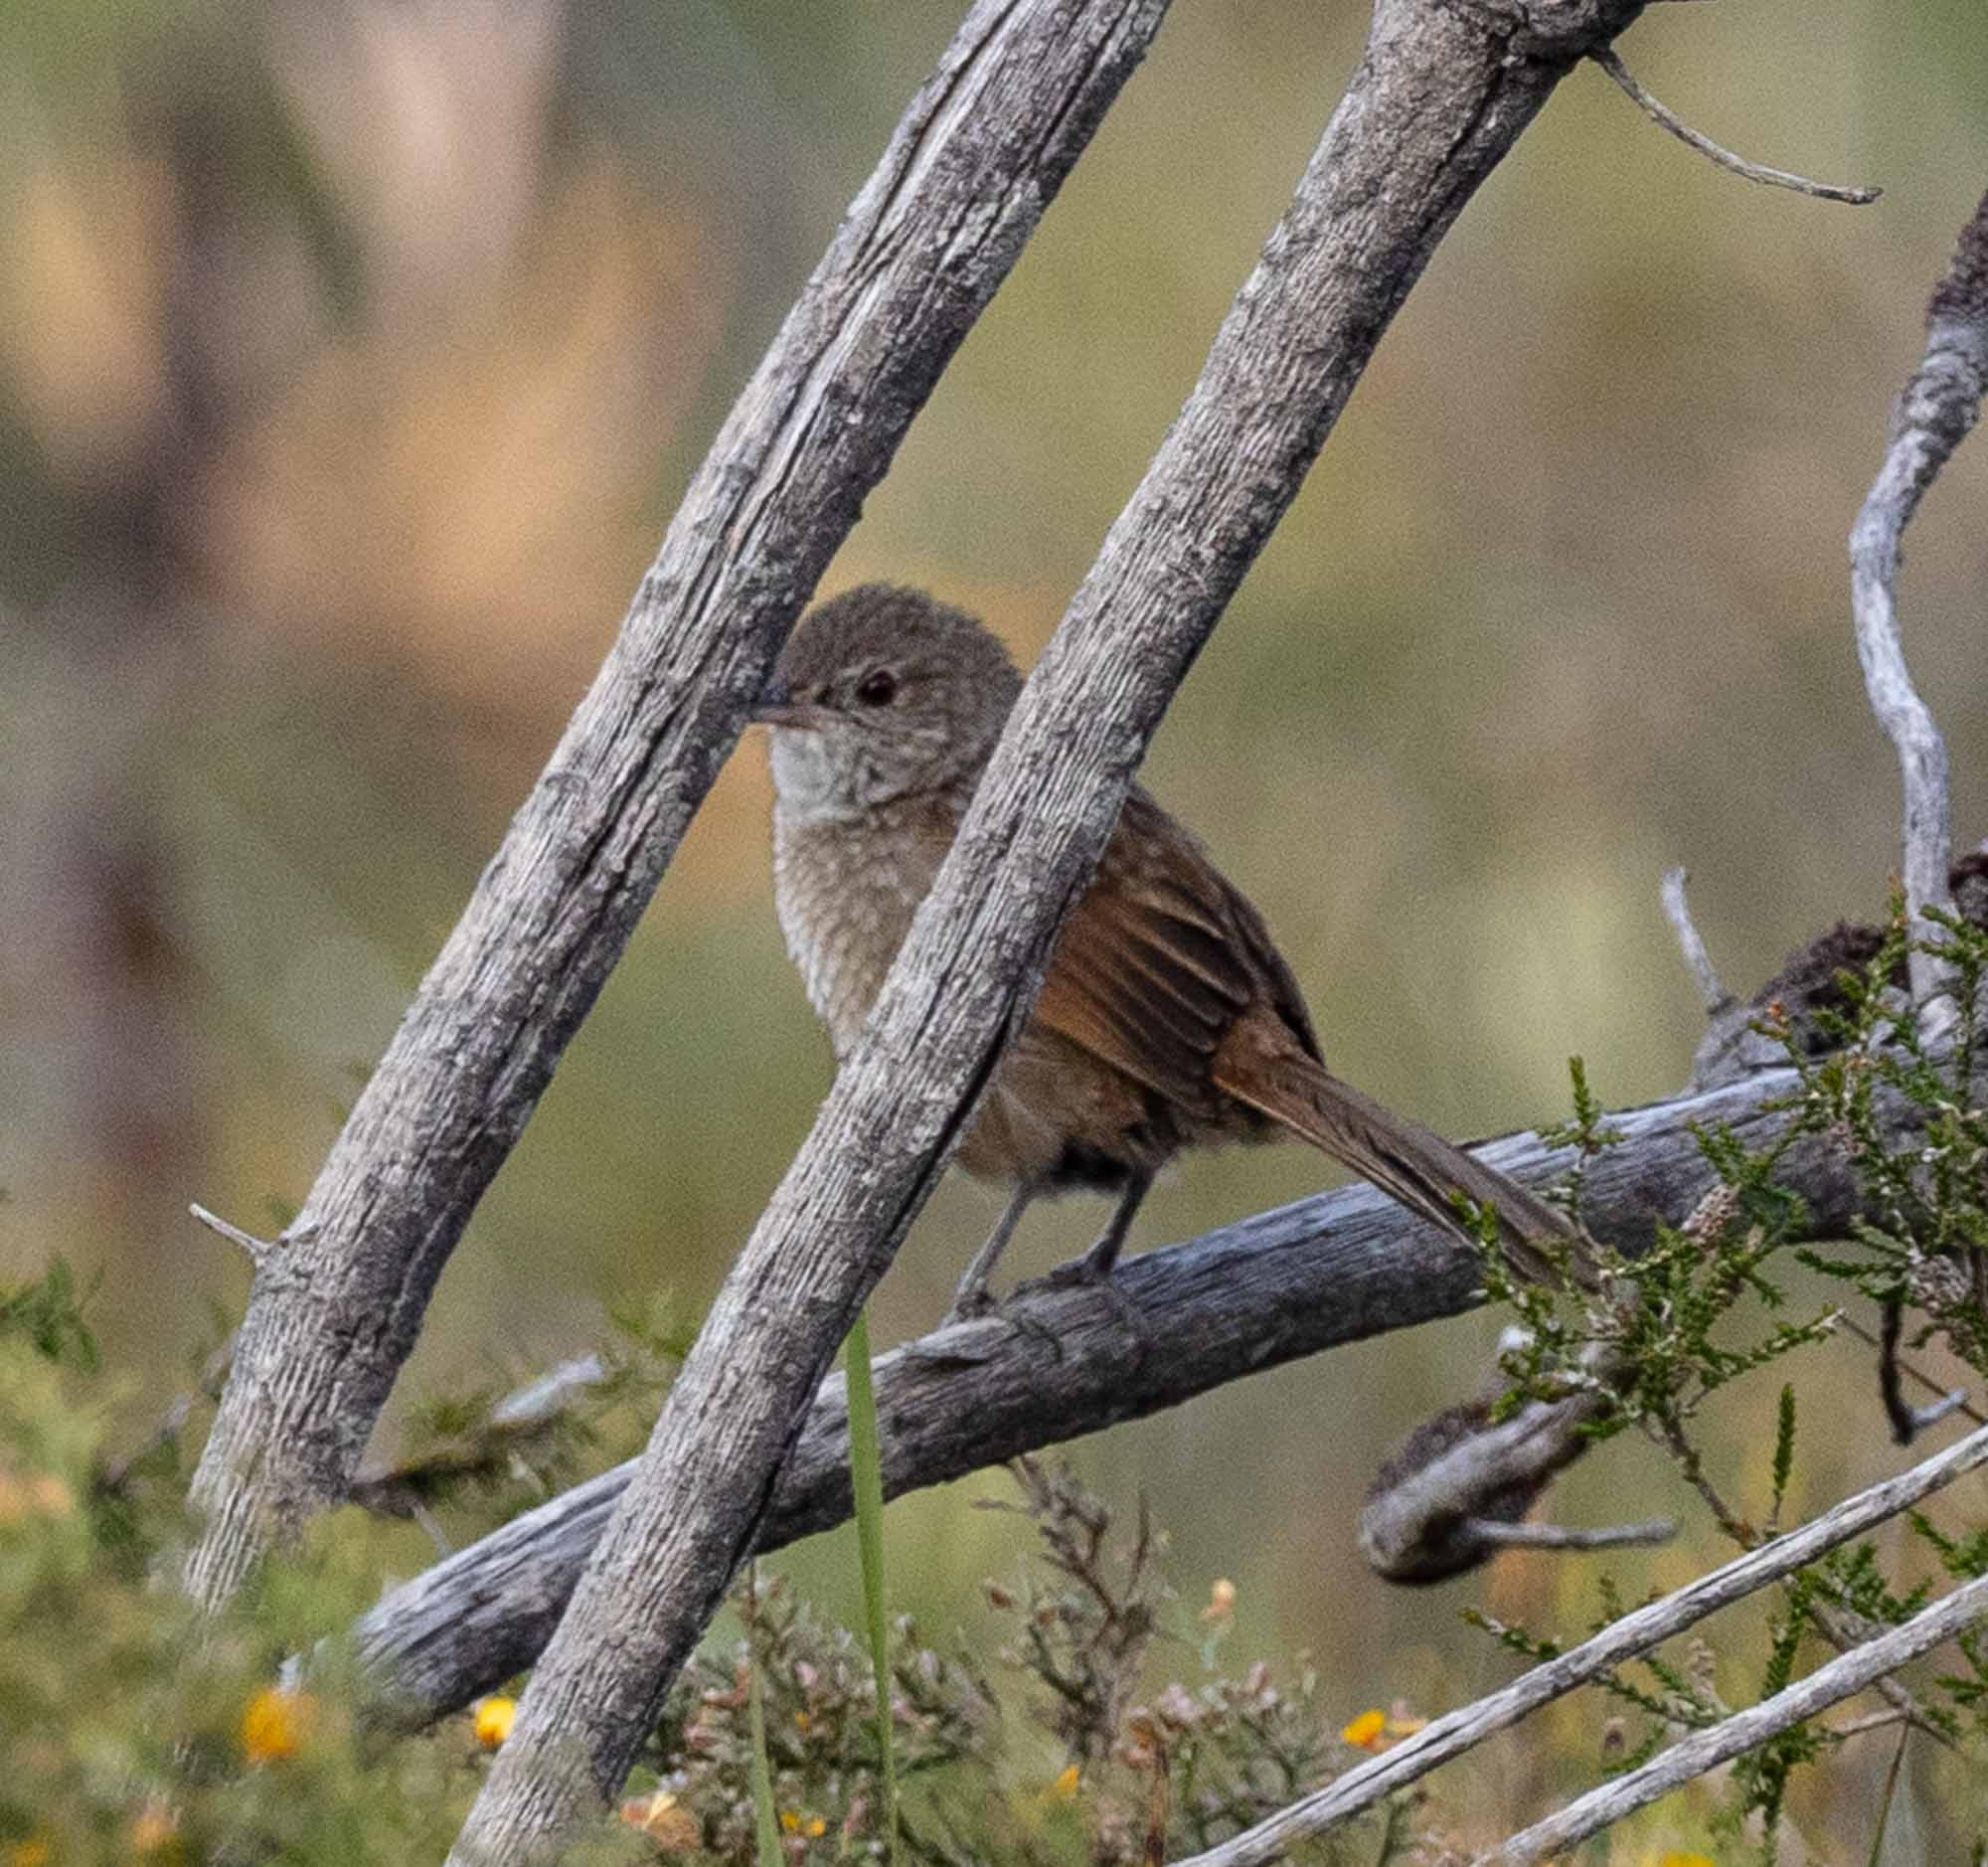 Western Bristlebird sighting #2 - Day 3